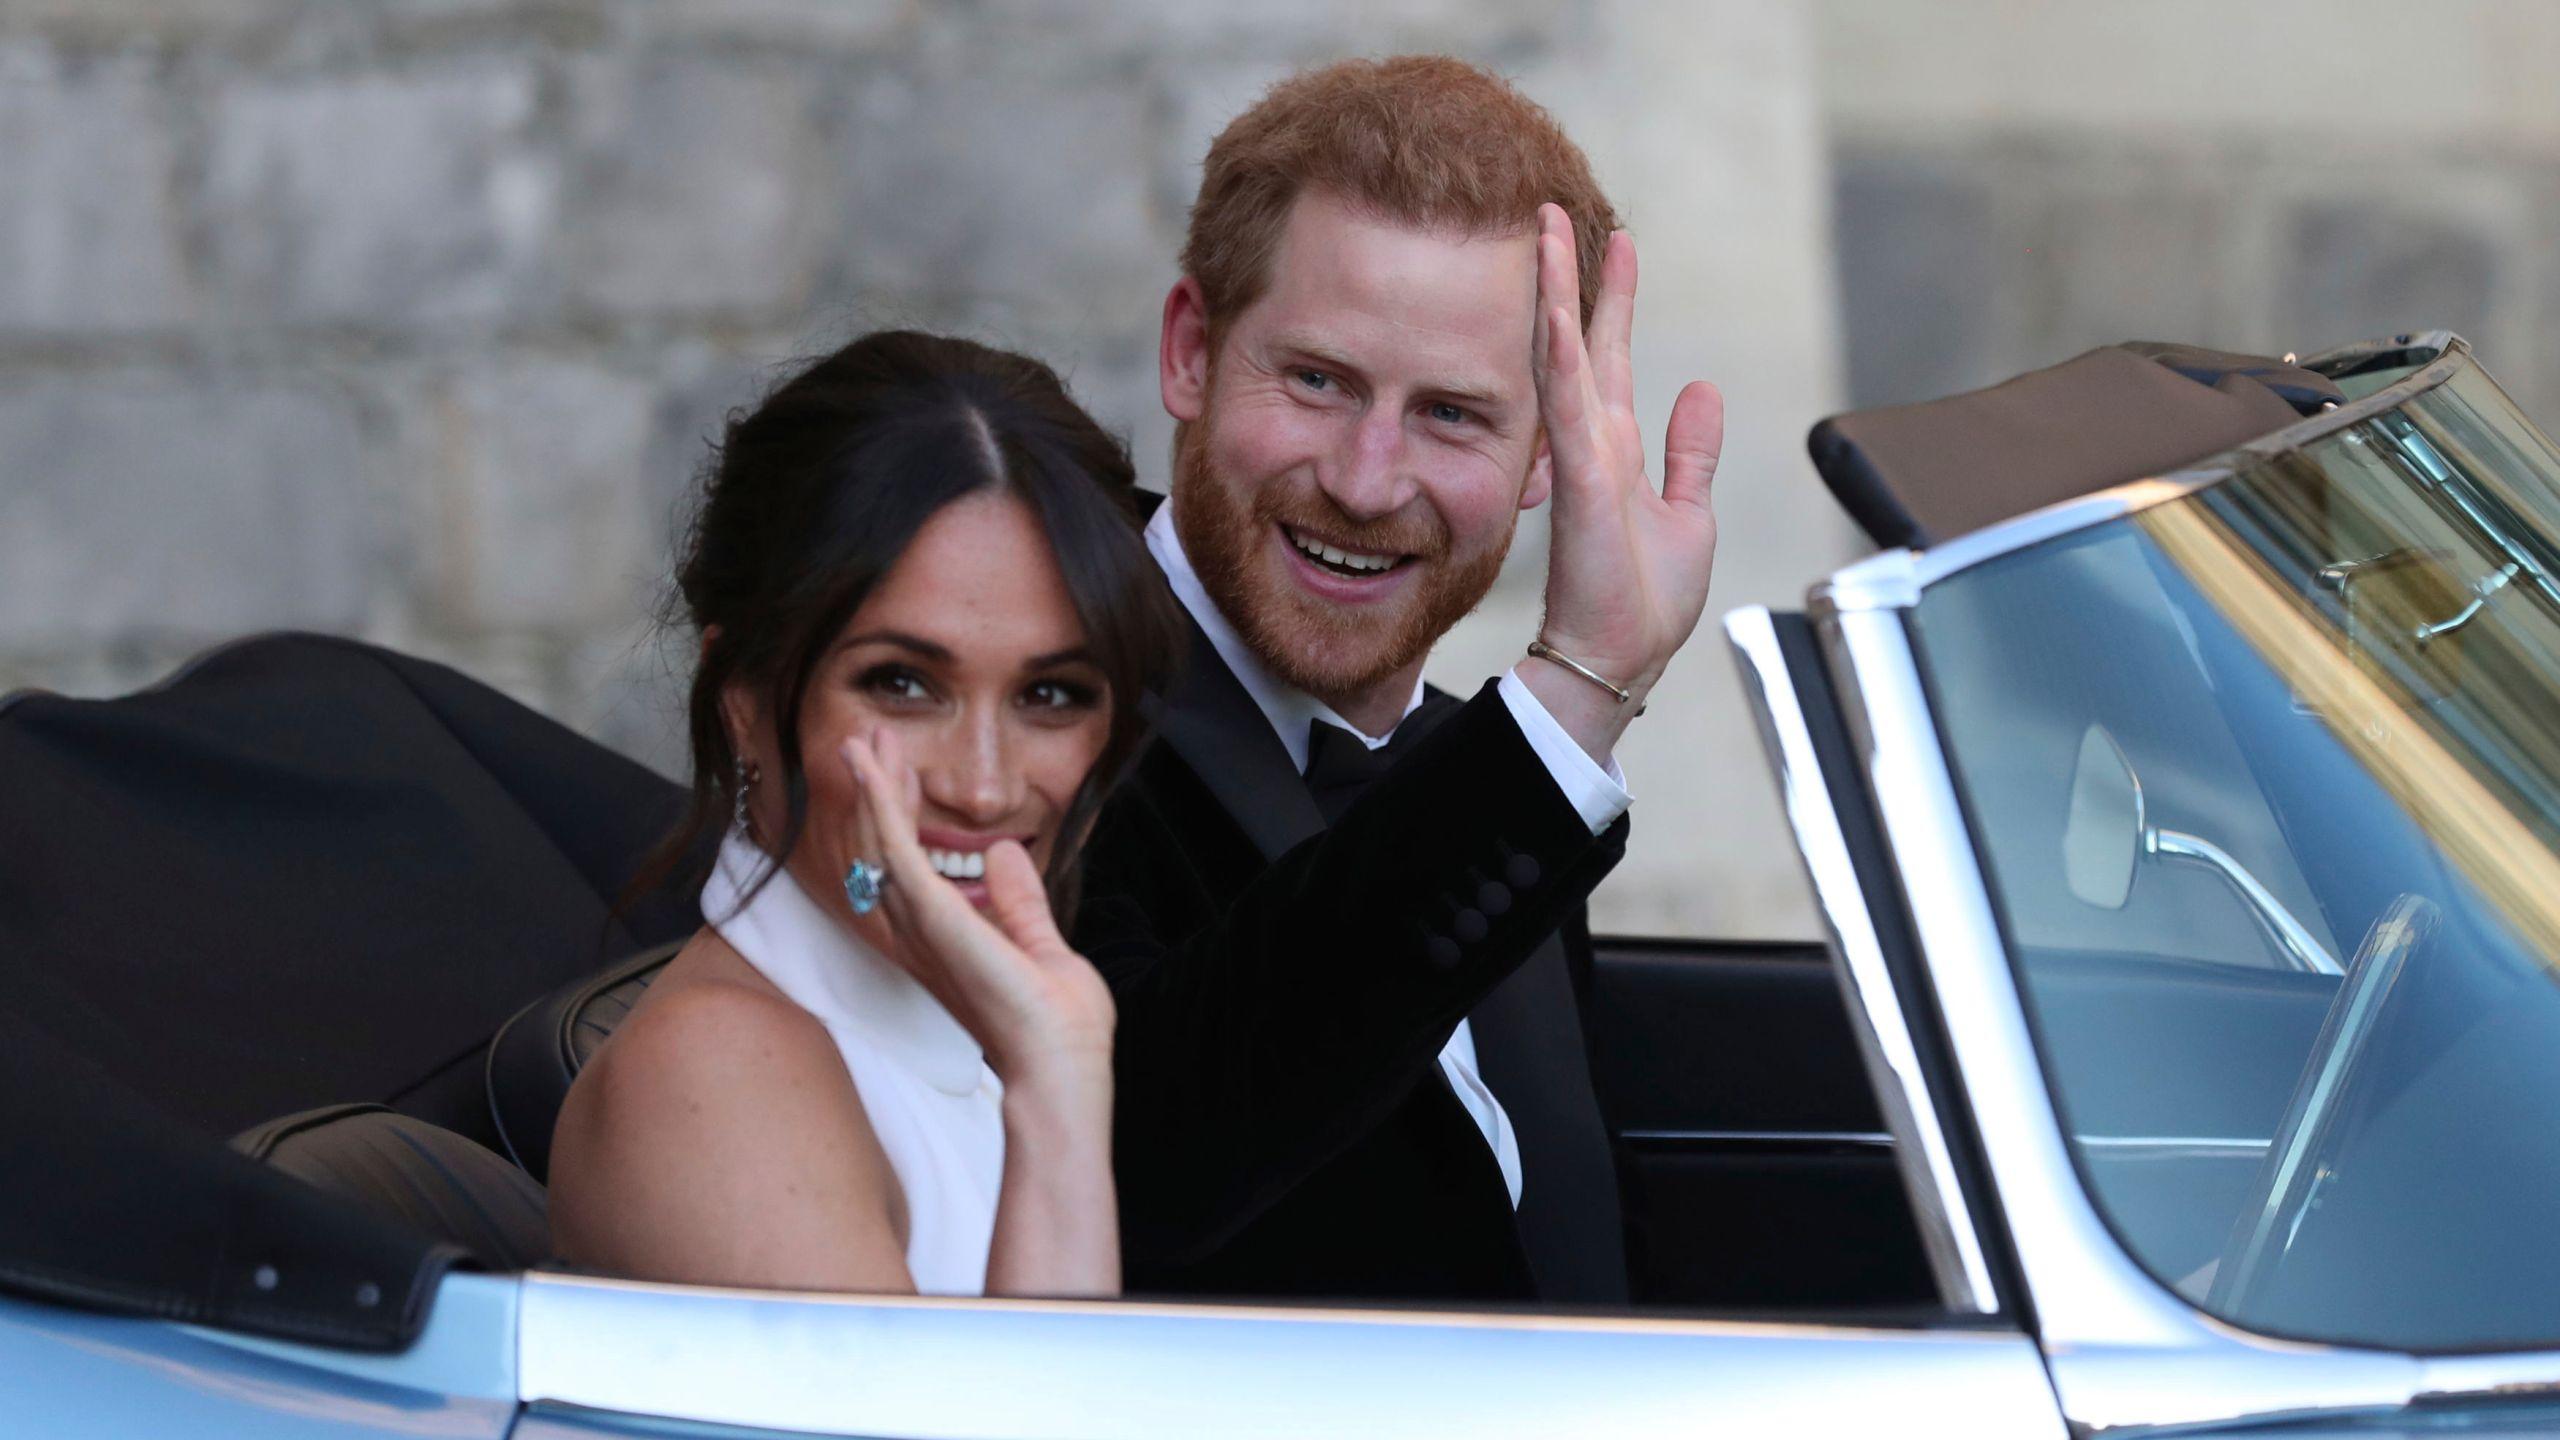 APTOPIX_Britain_Royal_Wedding_24942-159532.jpg77095460